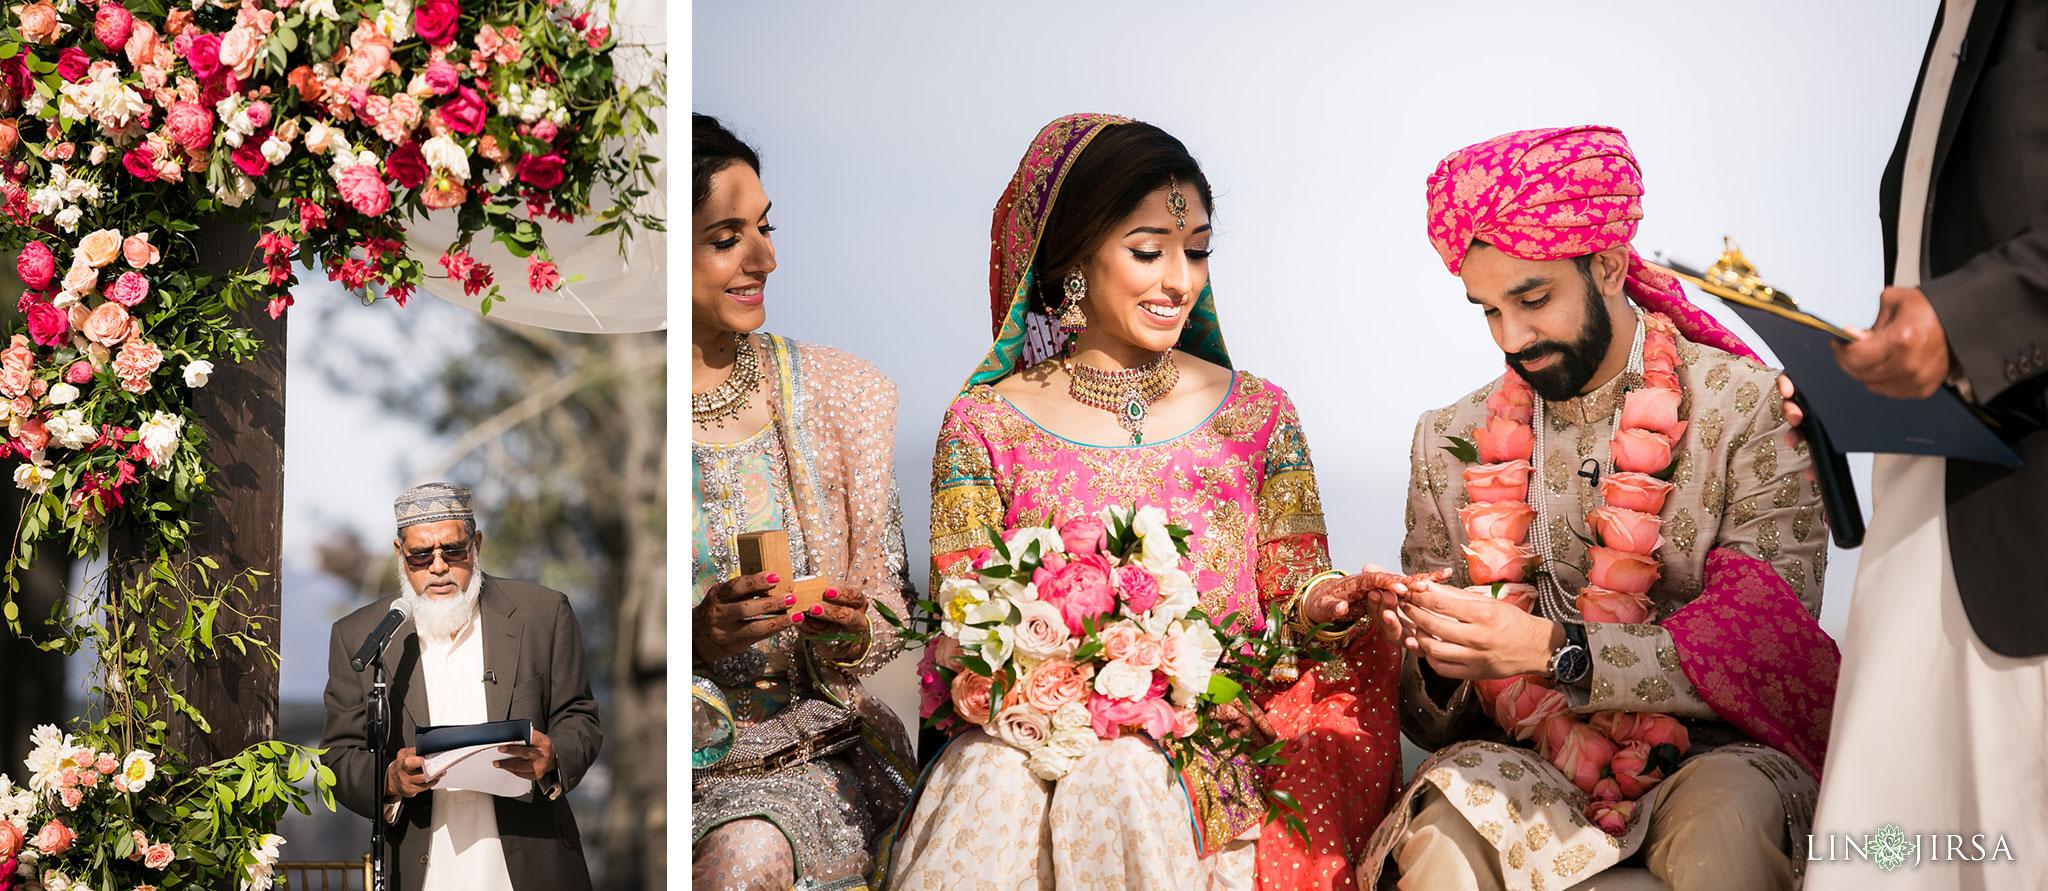 30 laguna cliffs marriott muslim wedding ceremony nikah photography